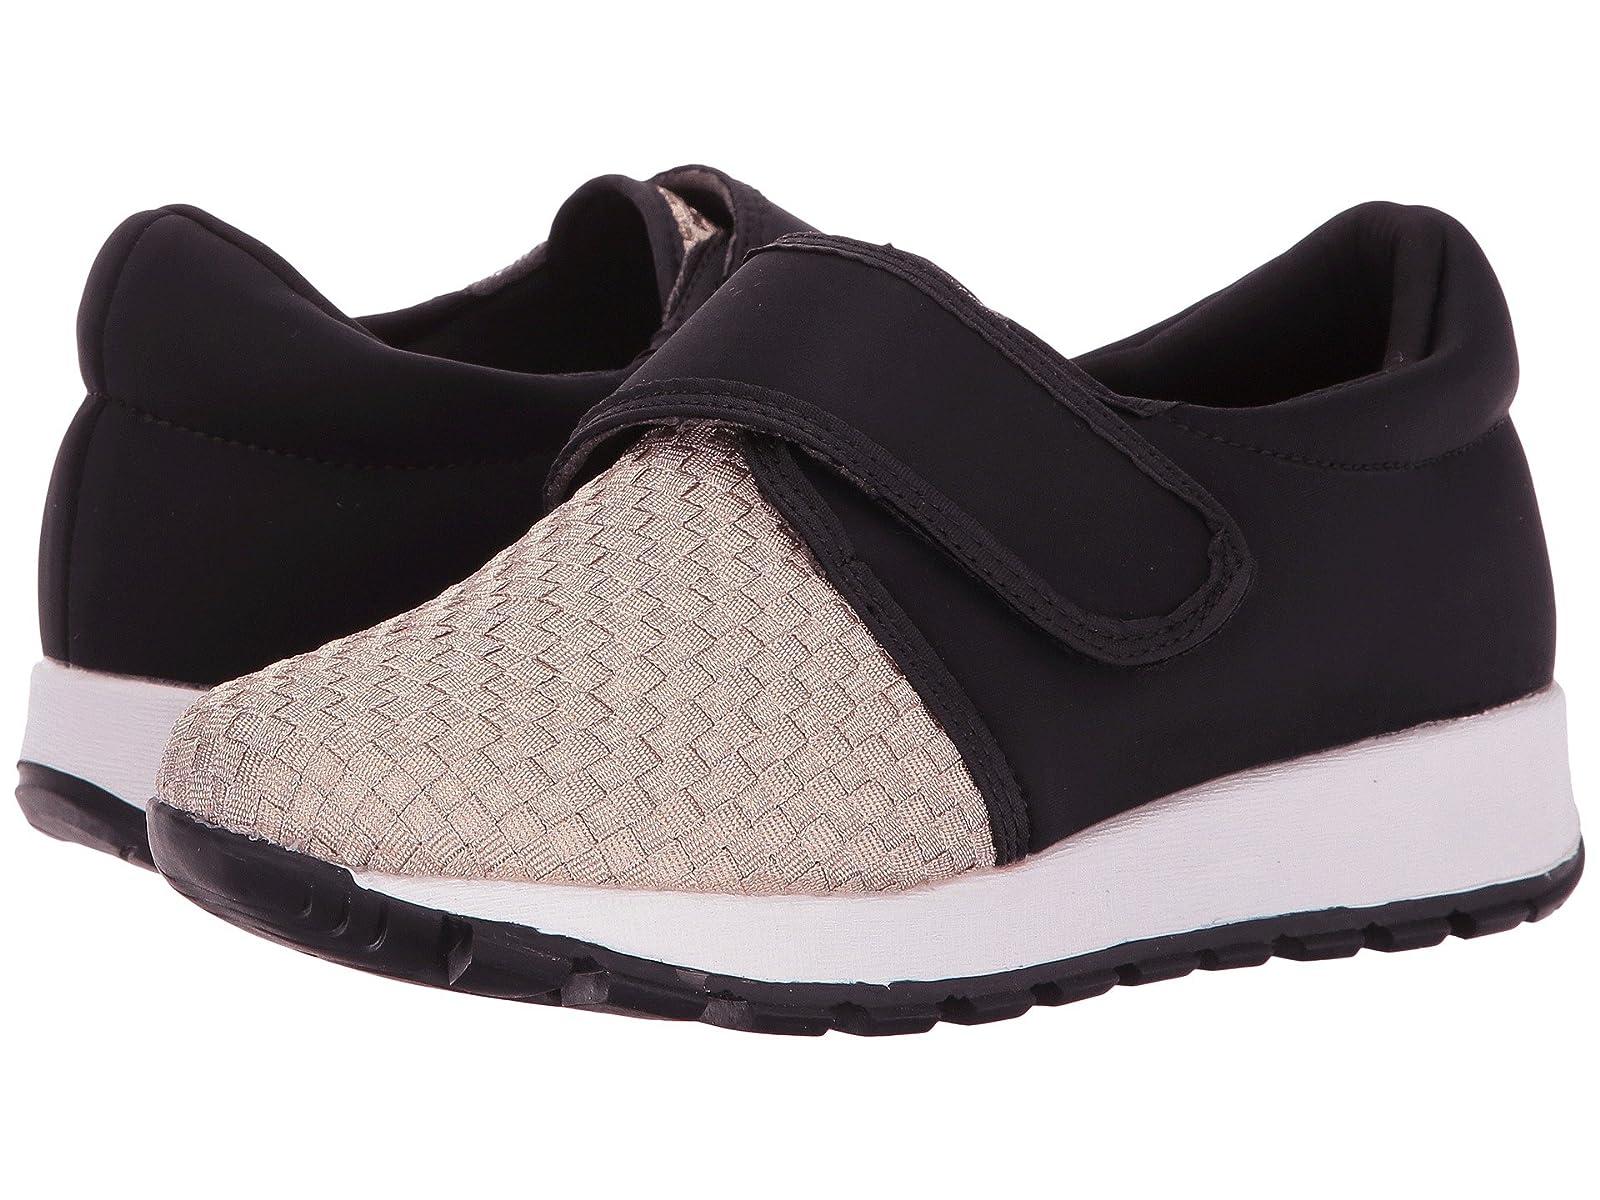 bernie mev. JasmineCheap and distinctive eye-catching shoes